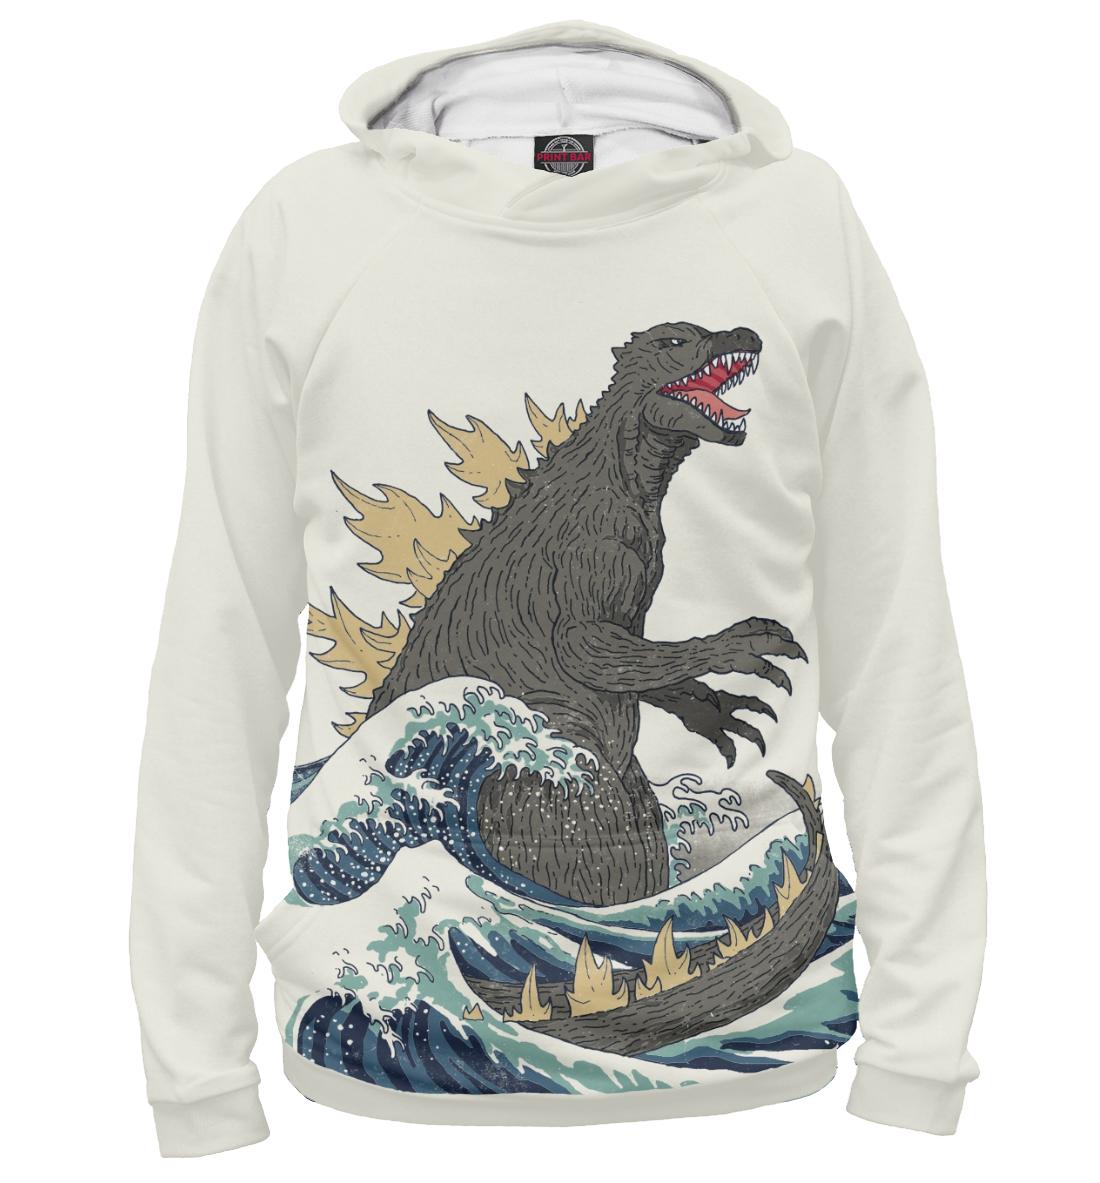 Купить Godzilla, Printbar, Худи, KNO-948120-hud-2